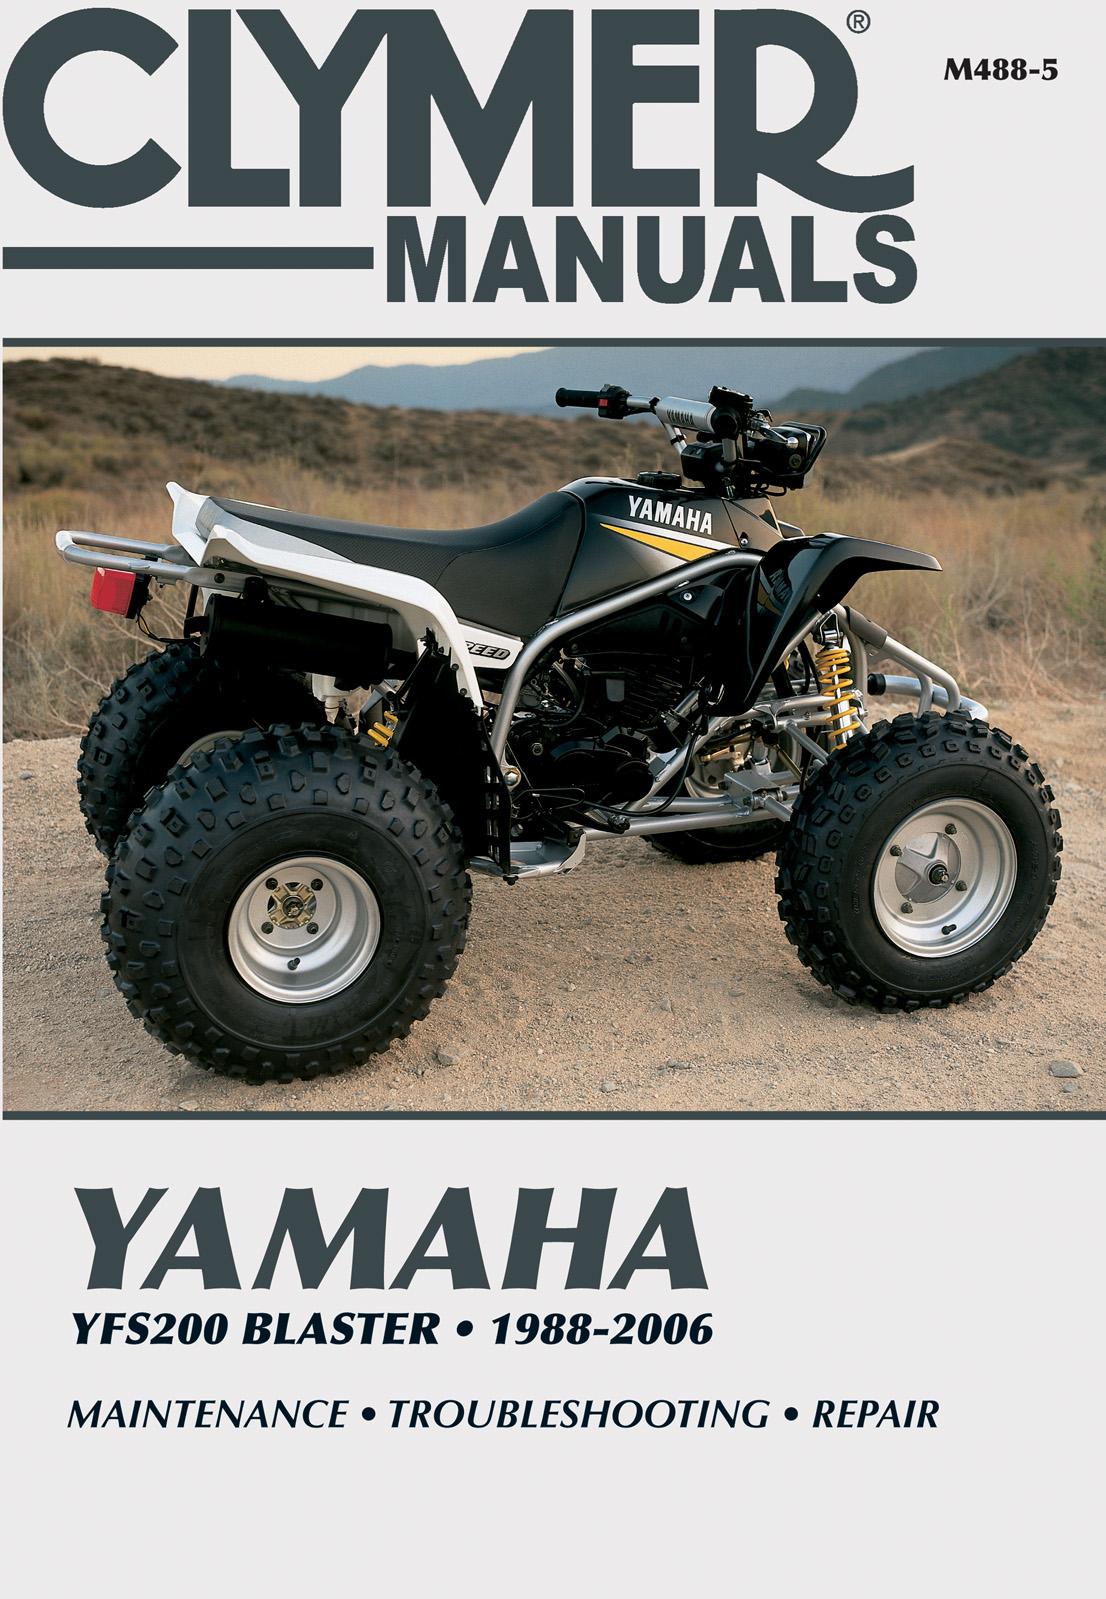 hight resolution of enlarge yamaha yfs200 blaster